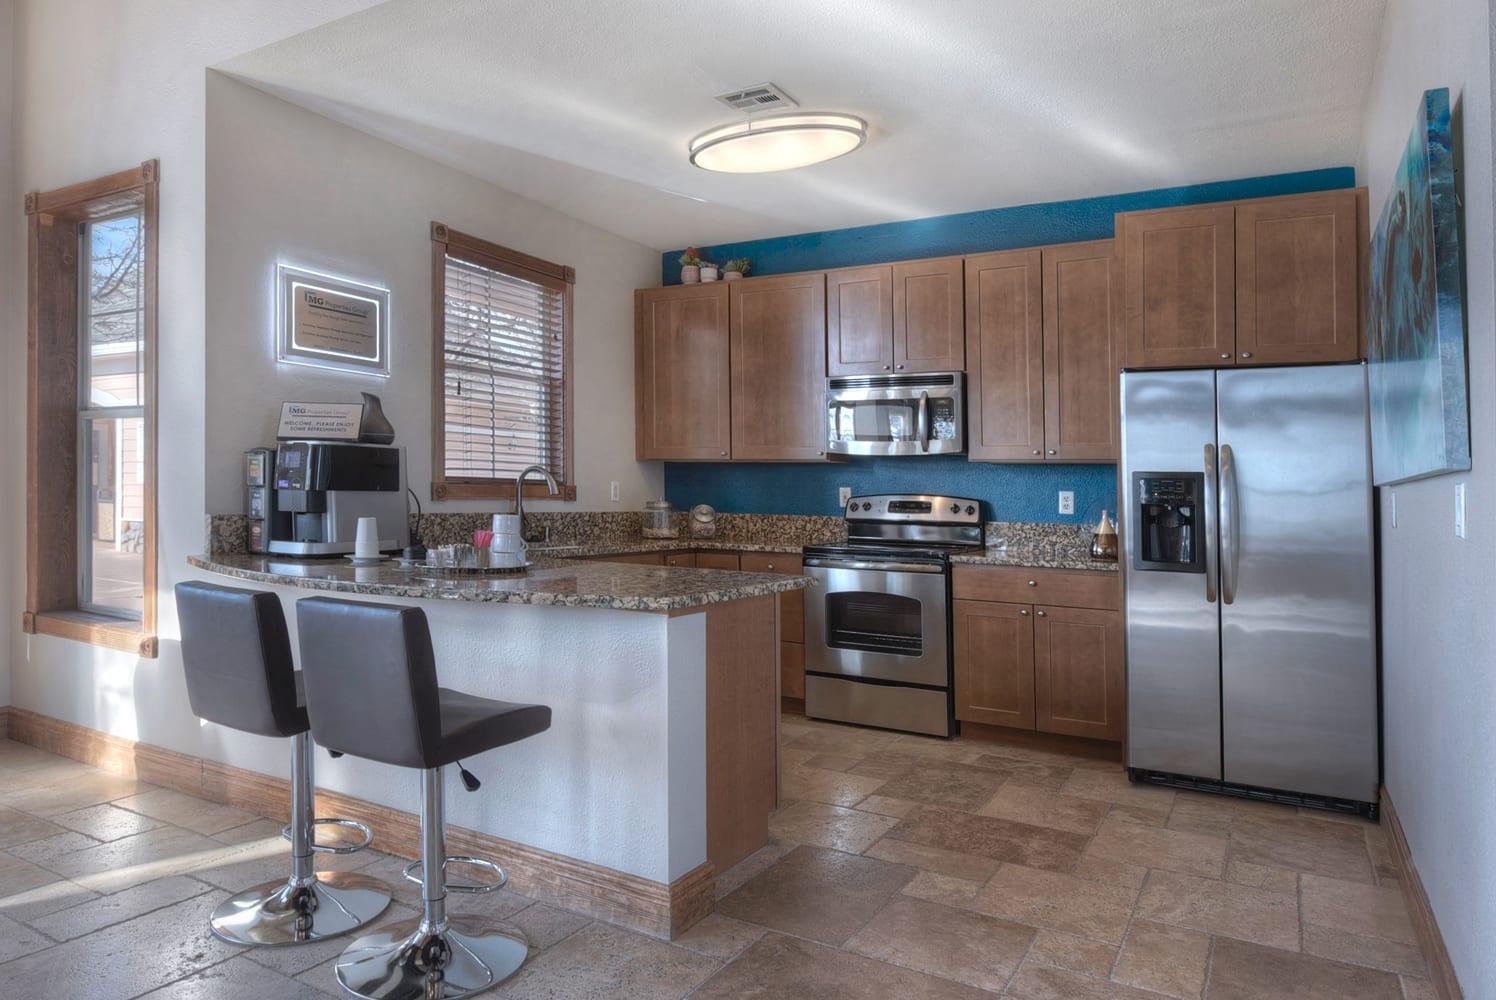 classic kitchen design at Manzanita Gate Apartment Homes, NV 89523